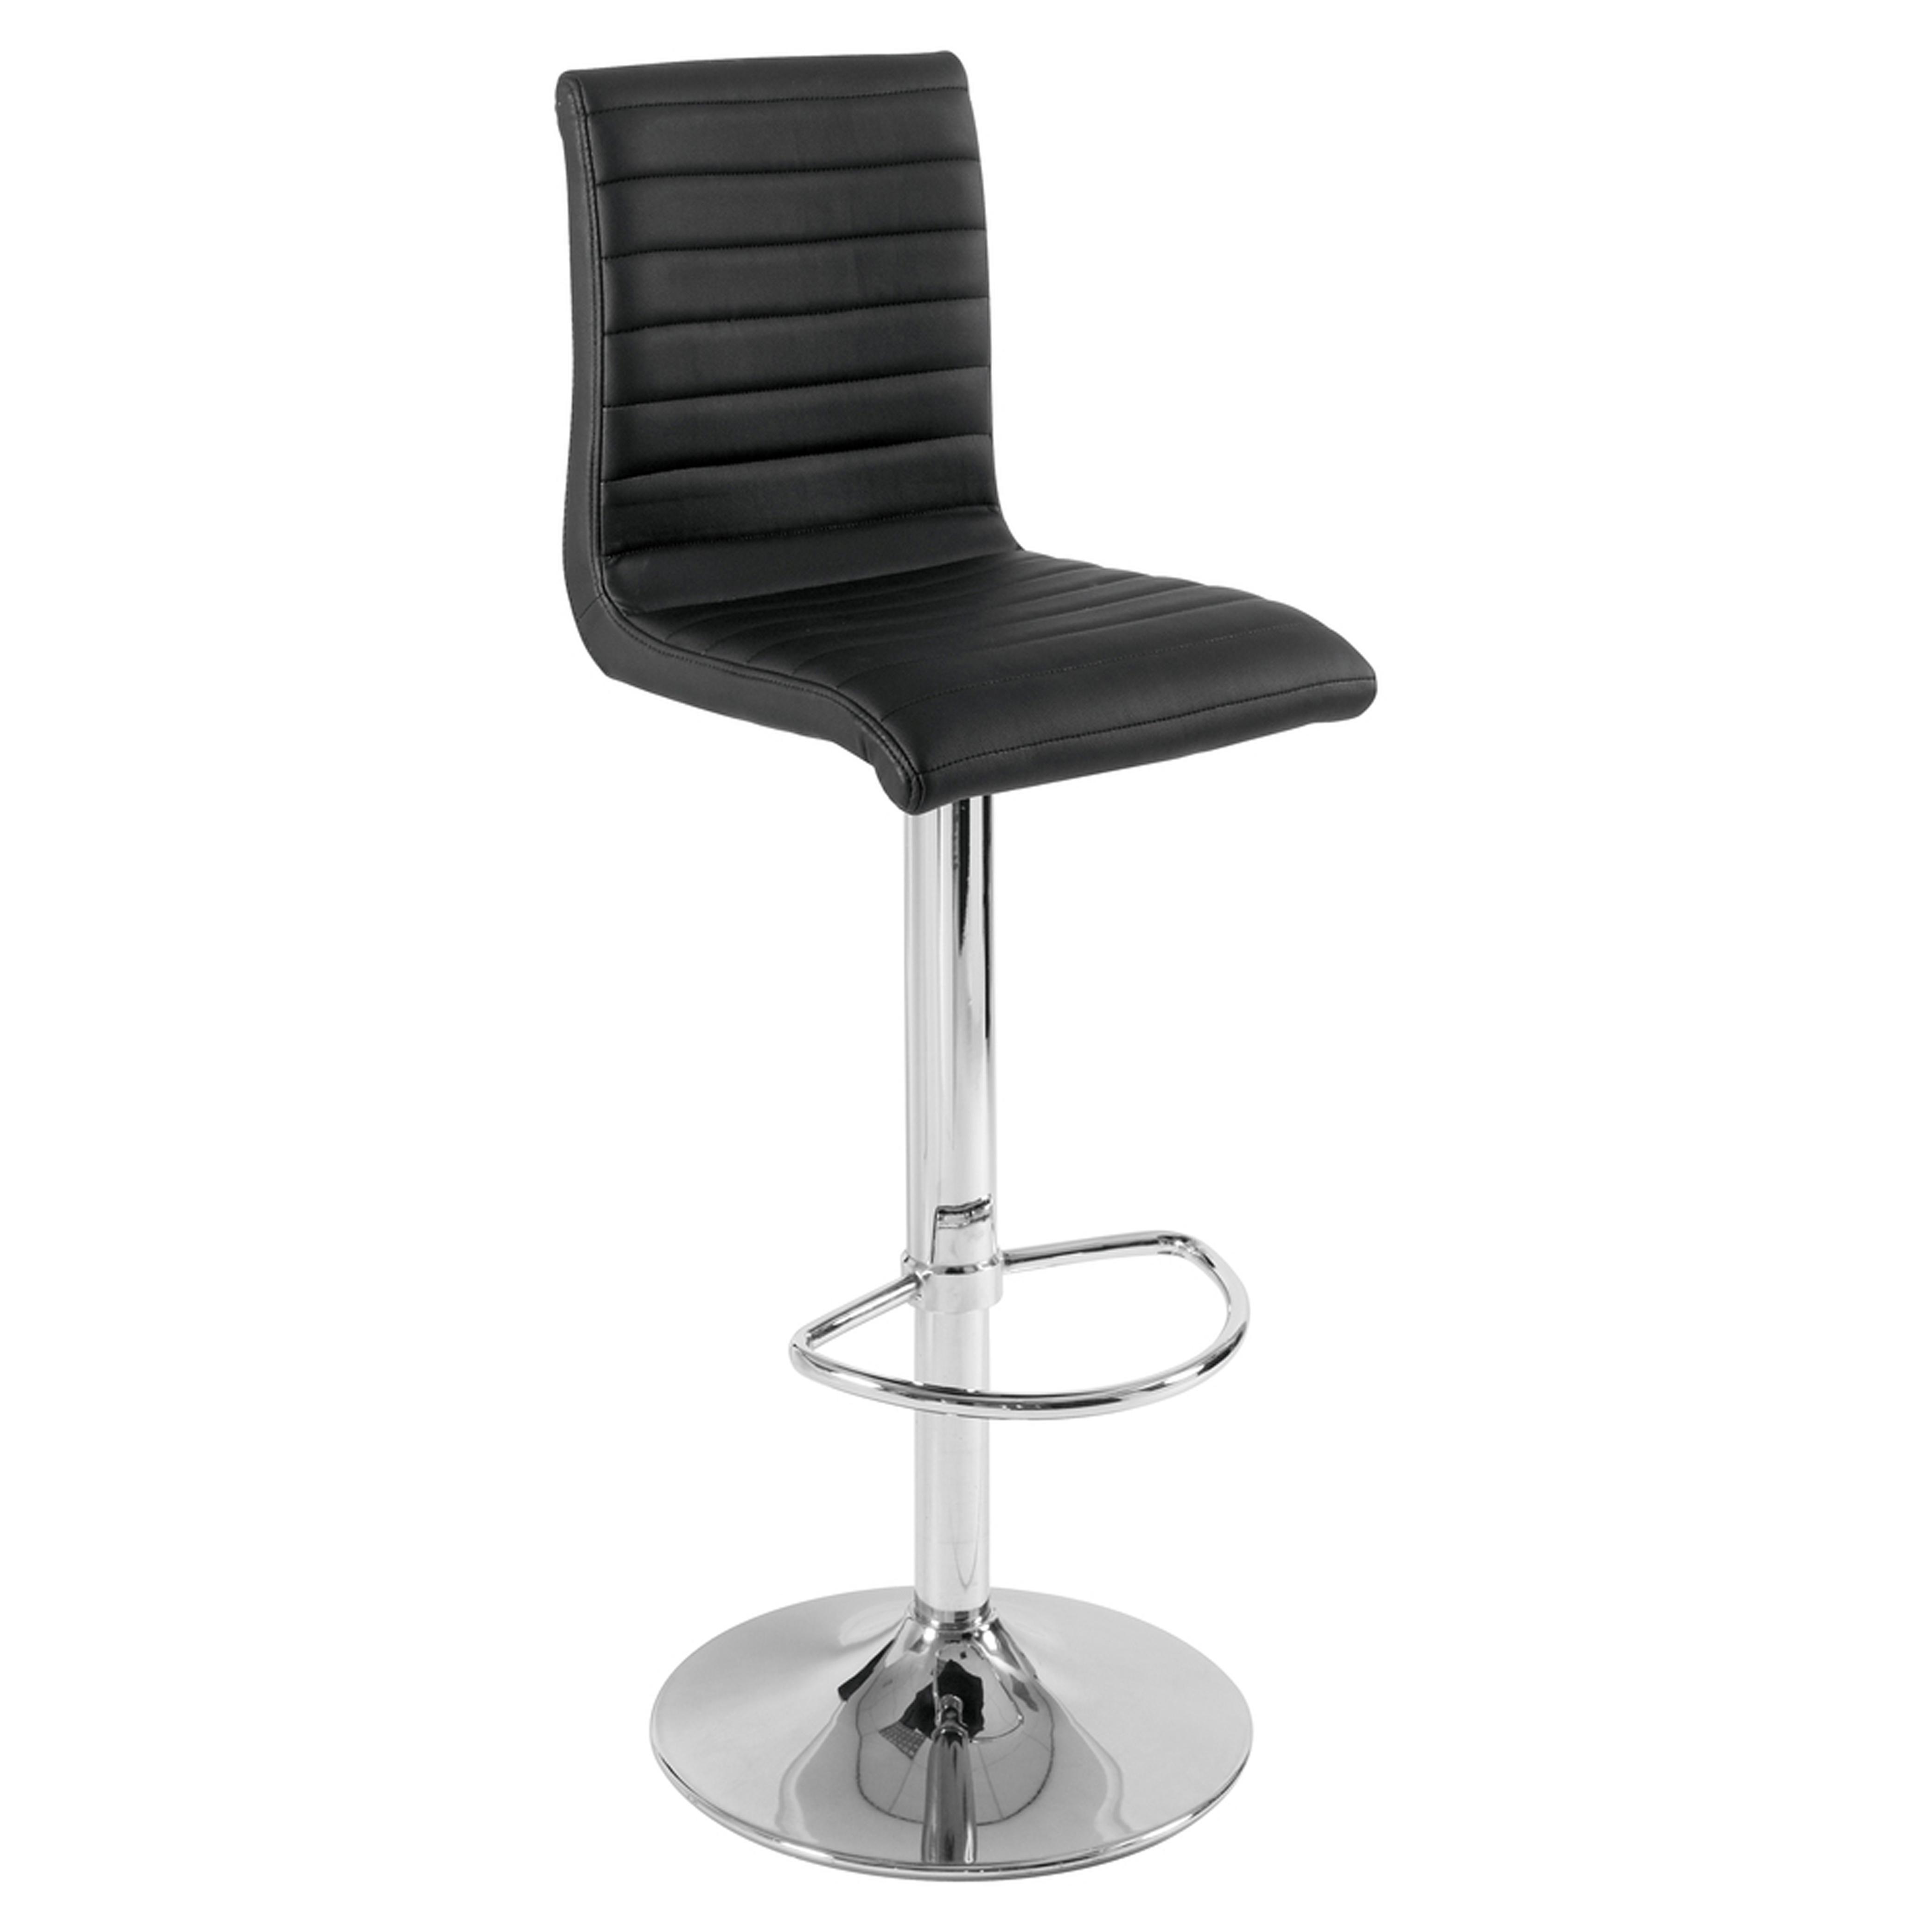 Versa bar stool black